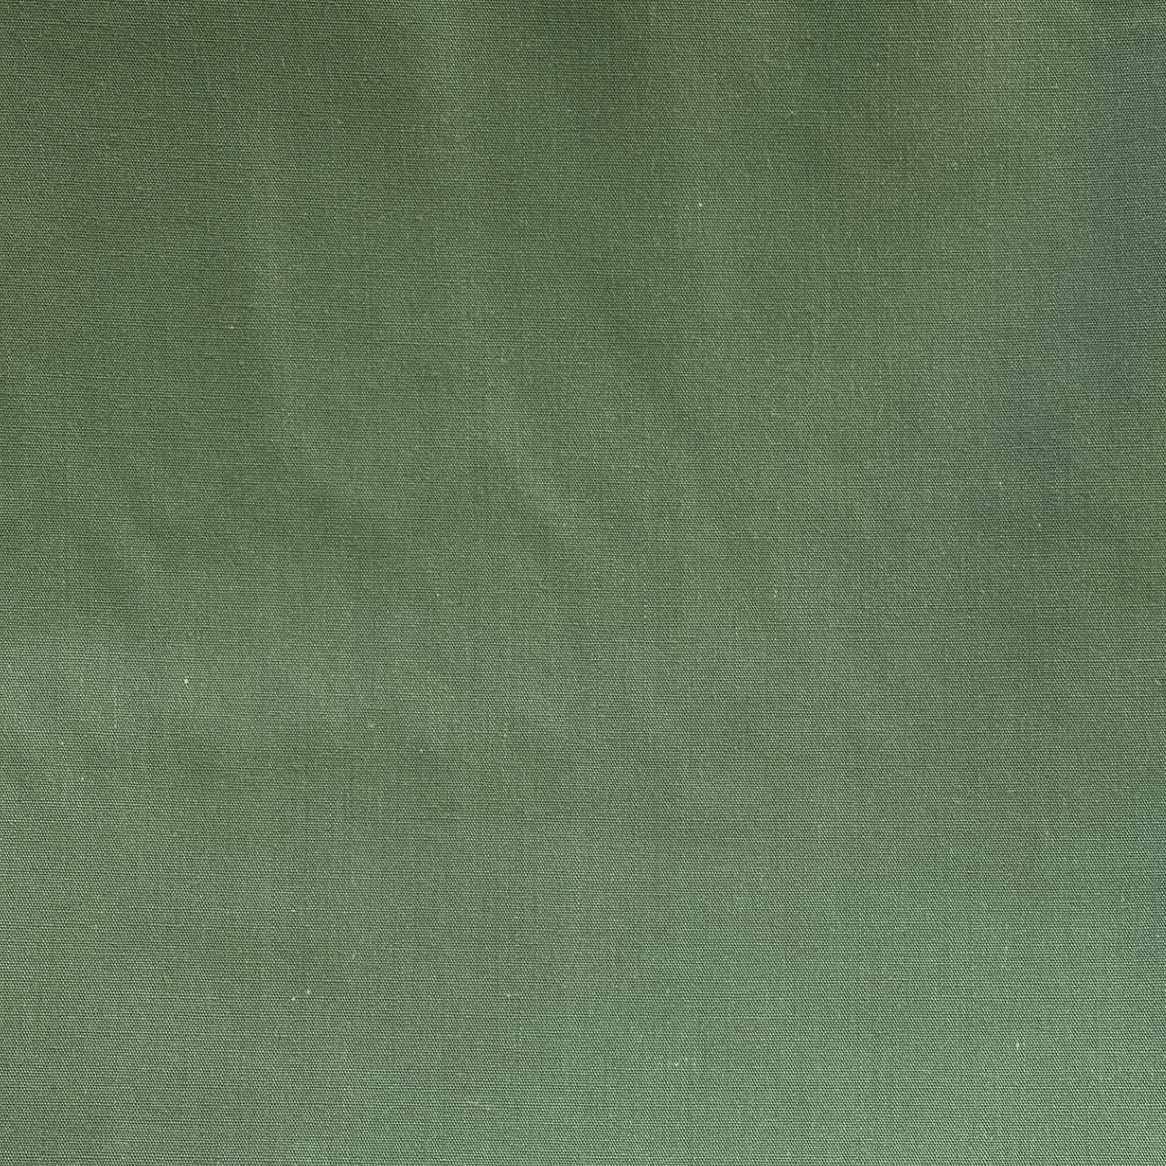 EasyFit Army Green Reusable Cloth Face Mask